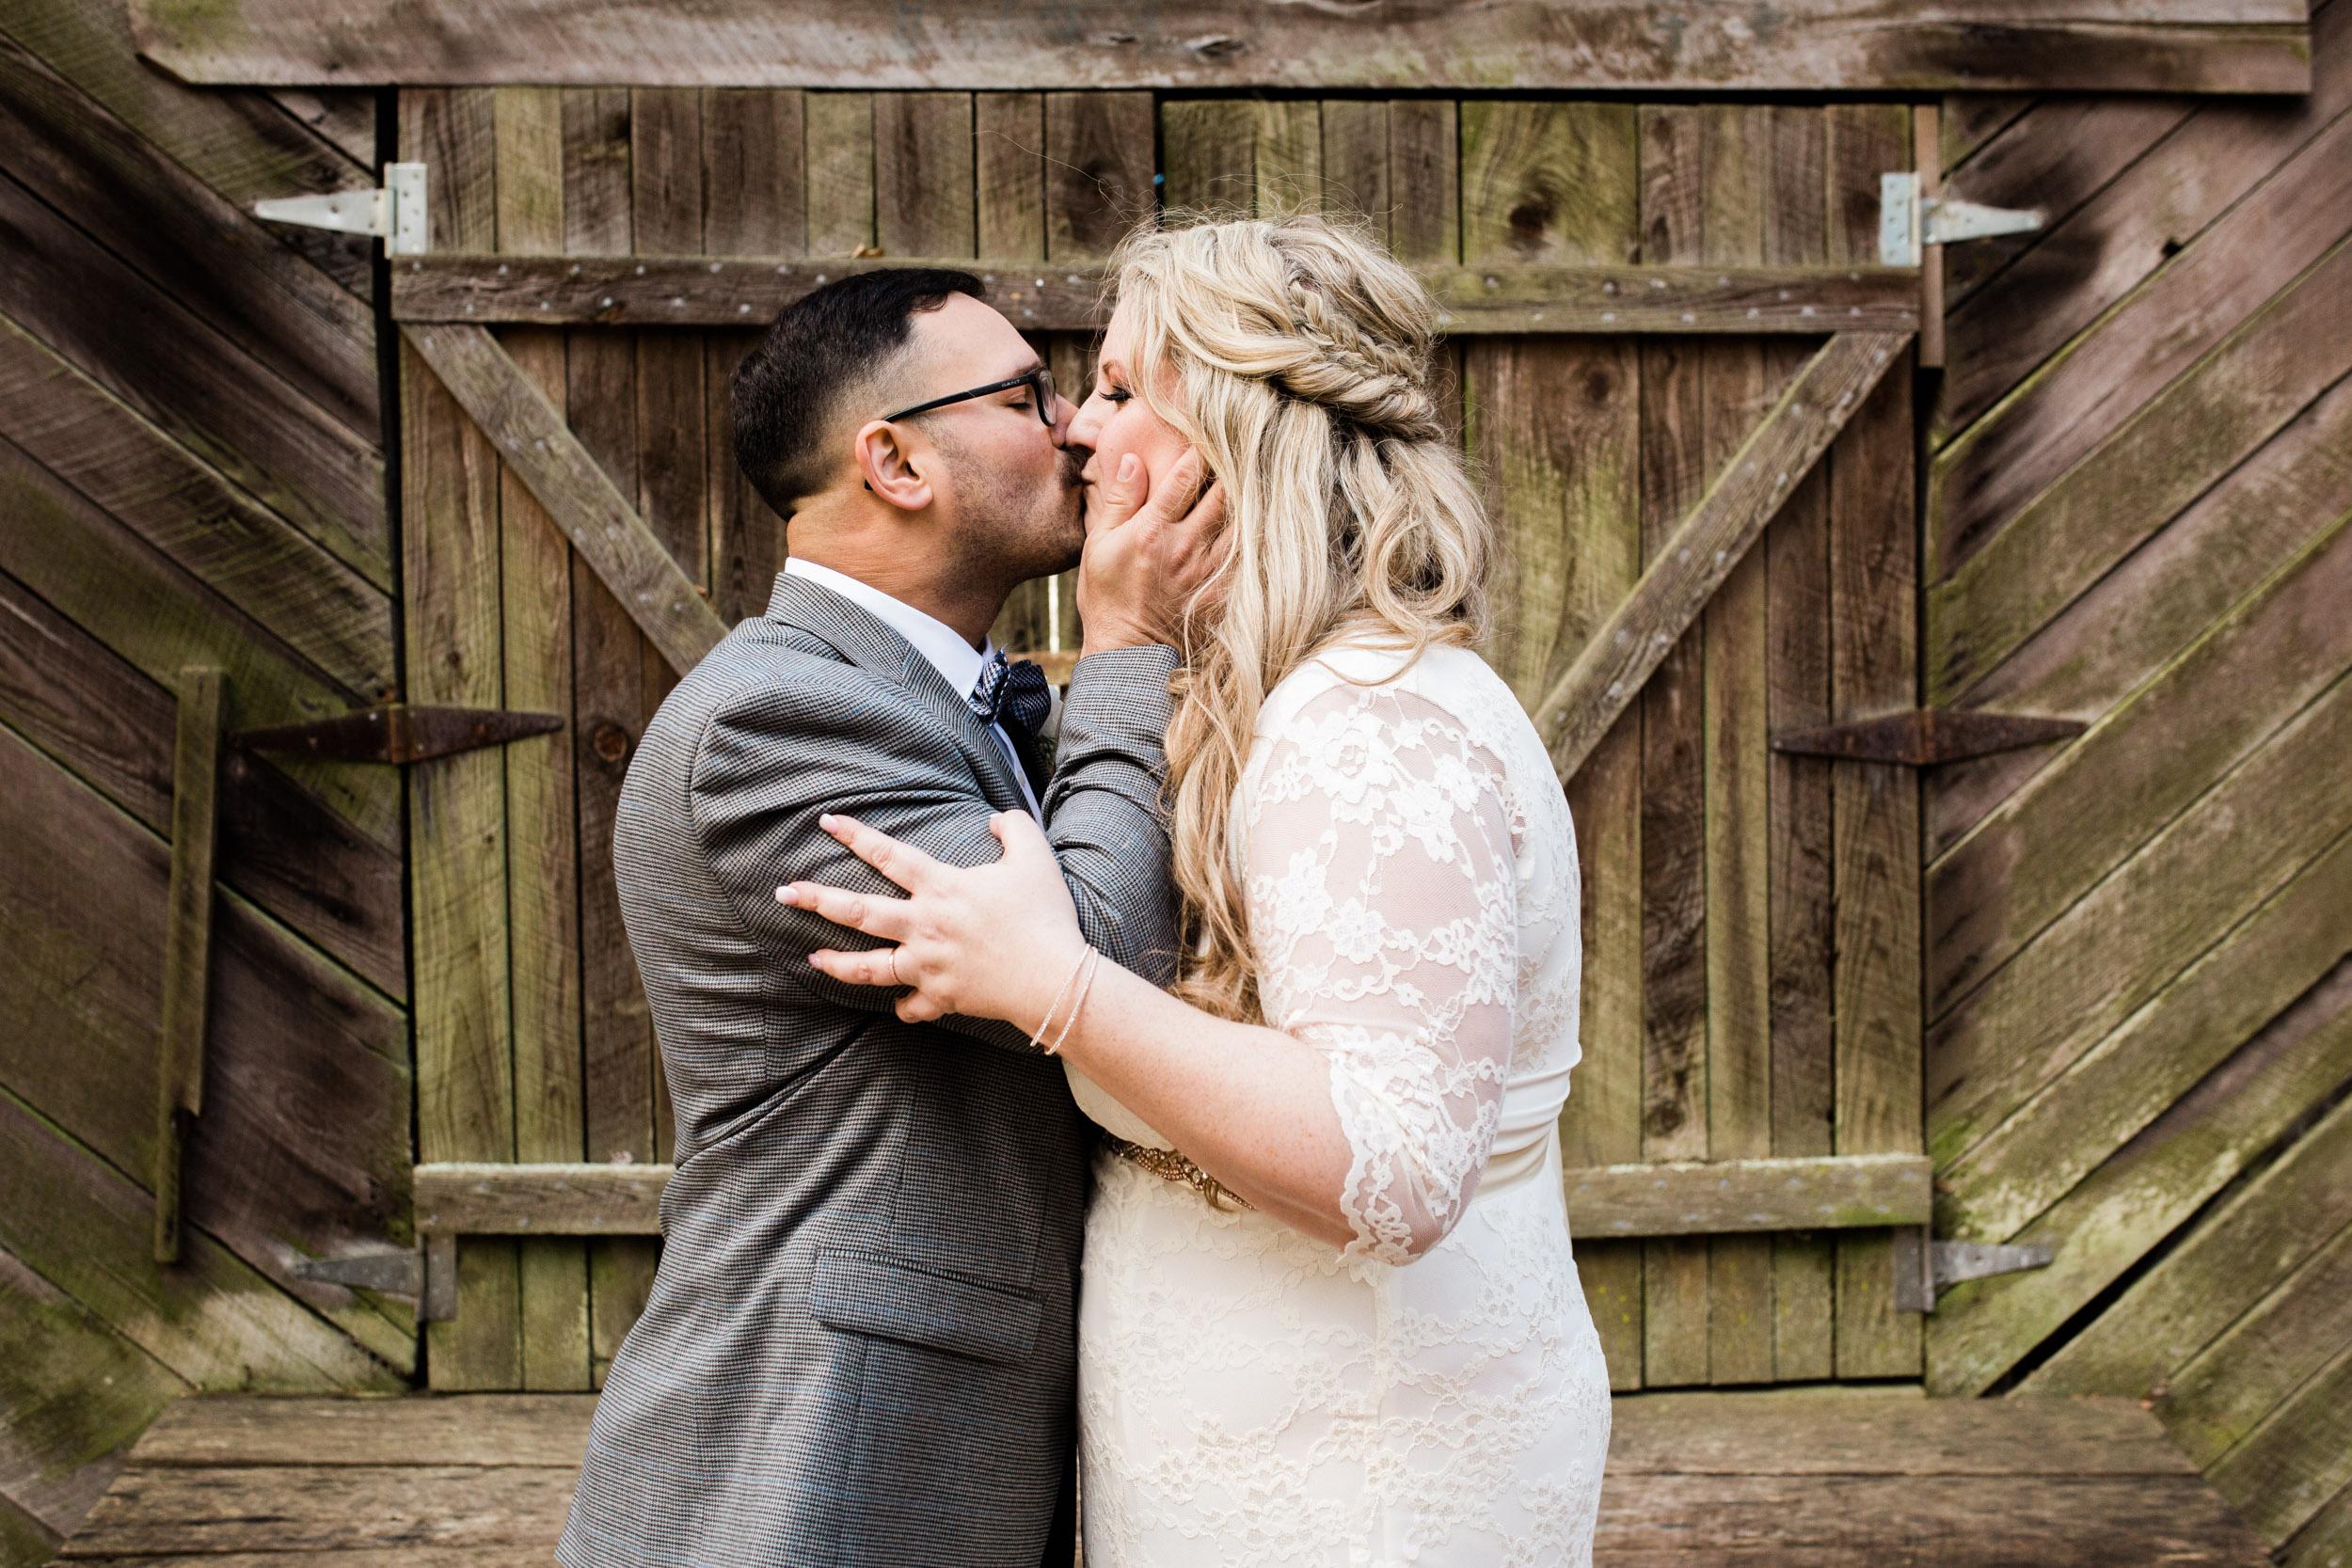 stephanie wedding photos (1 of 1)-6.jpg